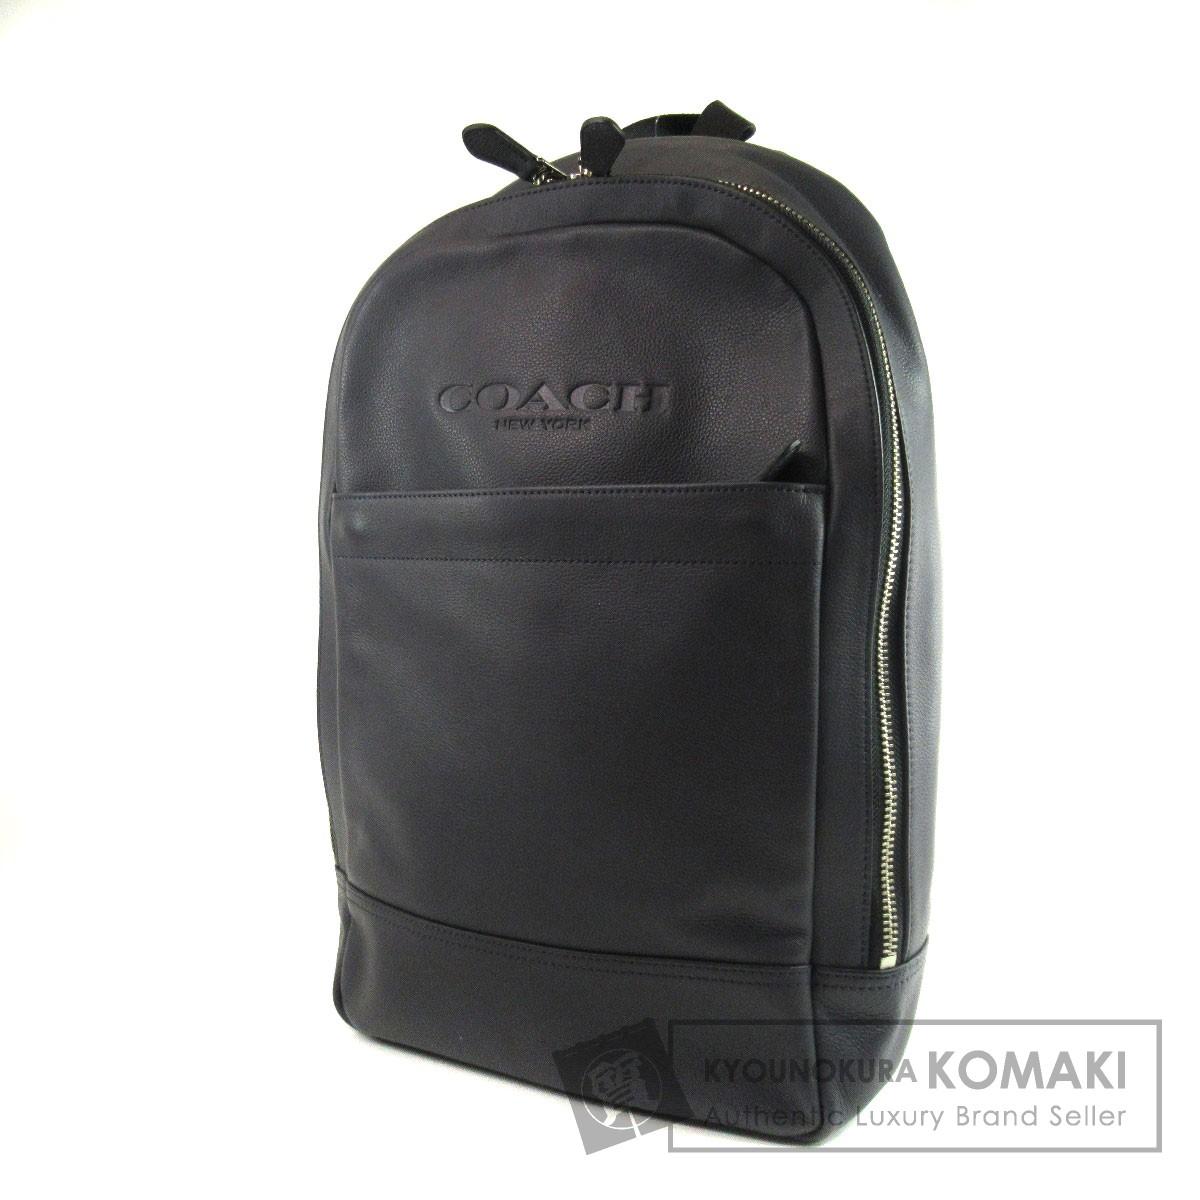 COACH F54135 リュック・デイパック レザー メンズ 【中古】【コーチ】